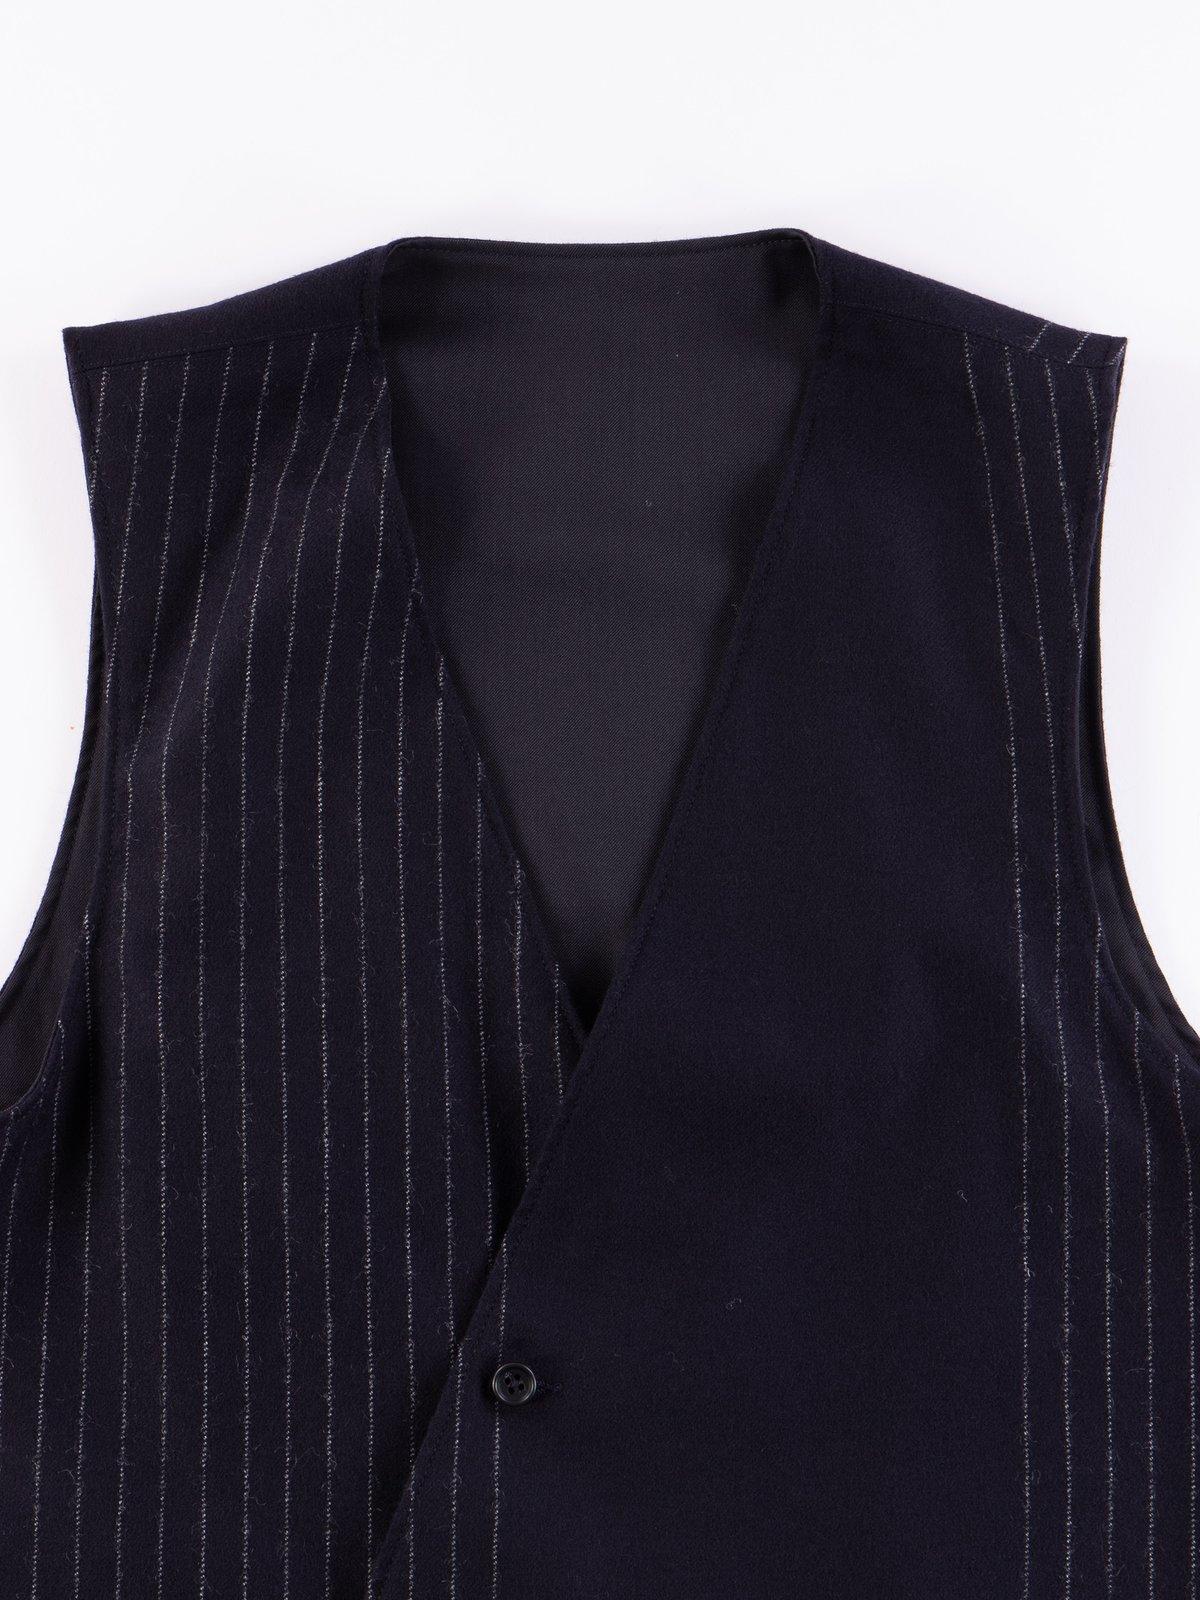 Dark Navy Worsted Wool Gabardine Reversible Vest - Image 6